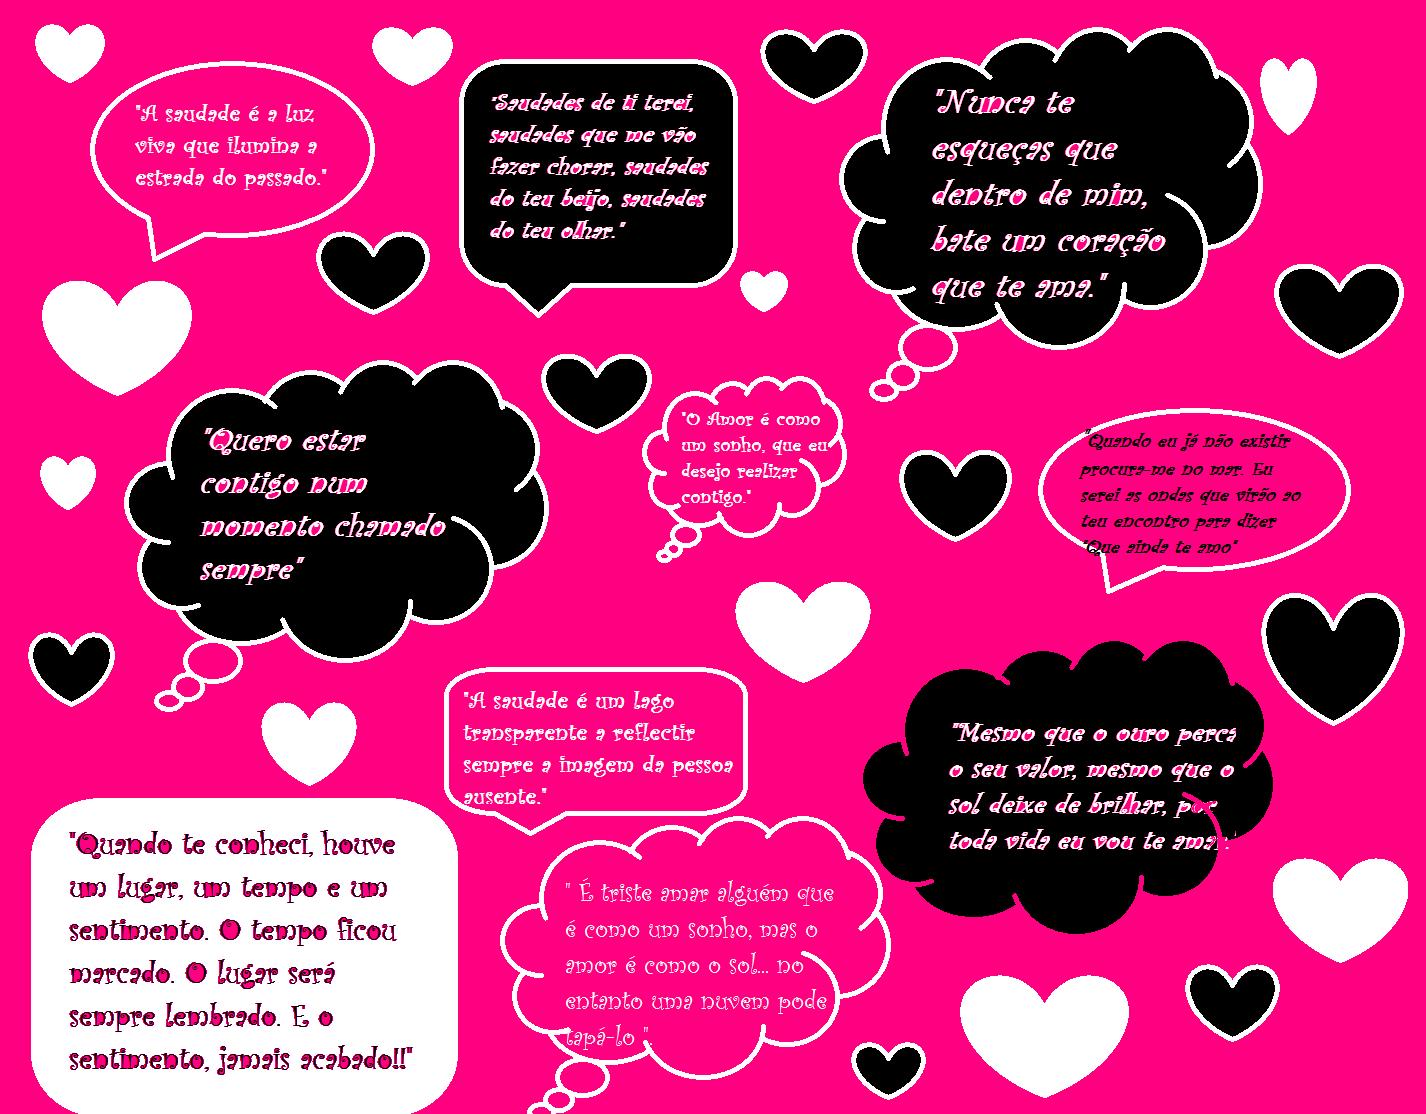 Para Garotas Apaixonadas 2011